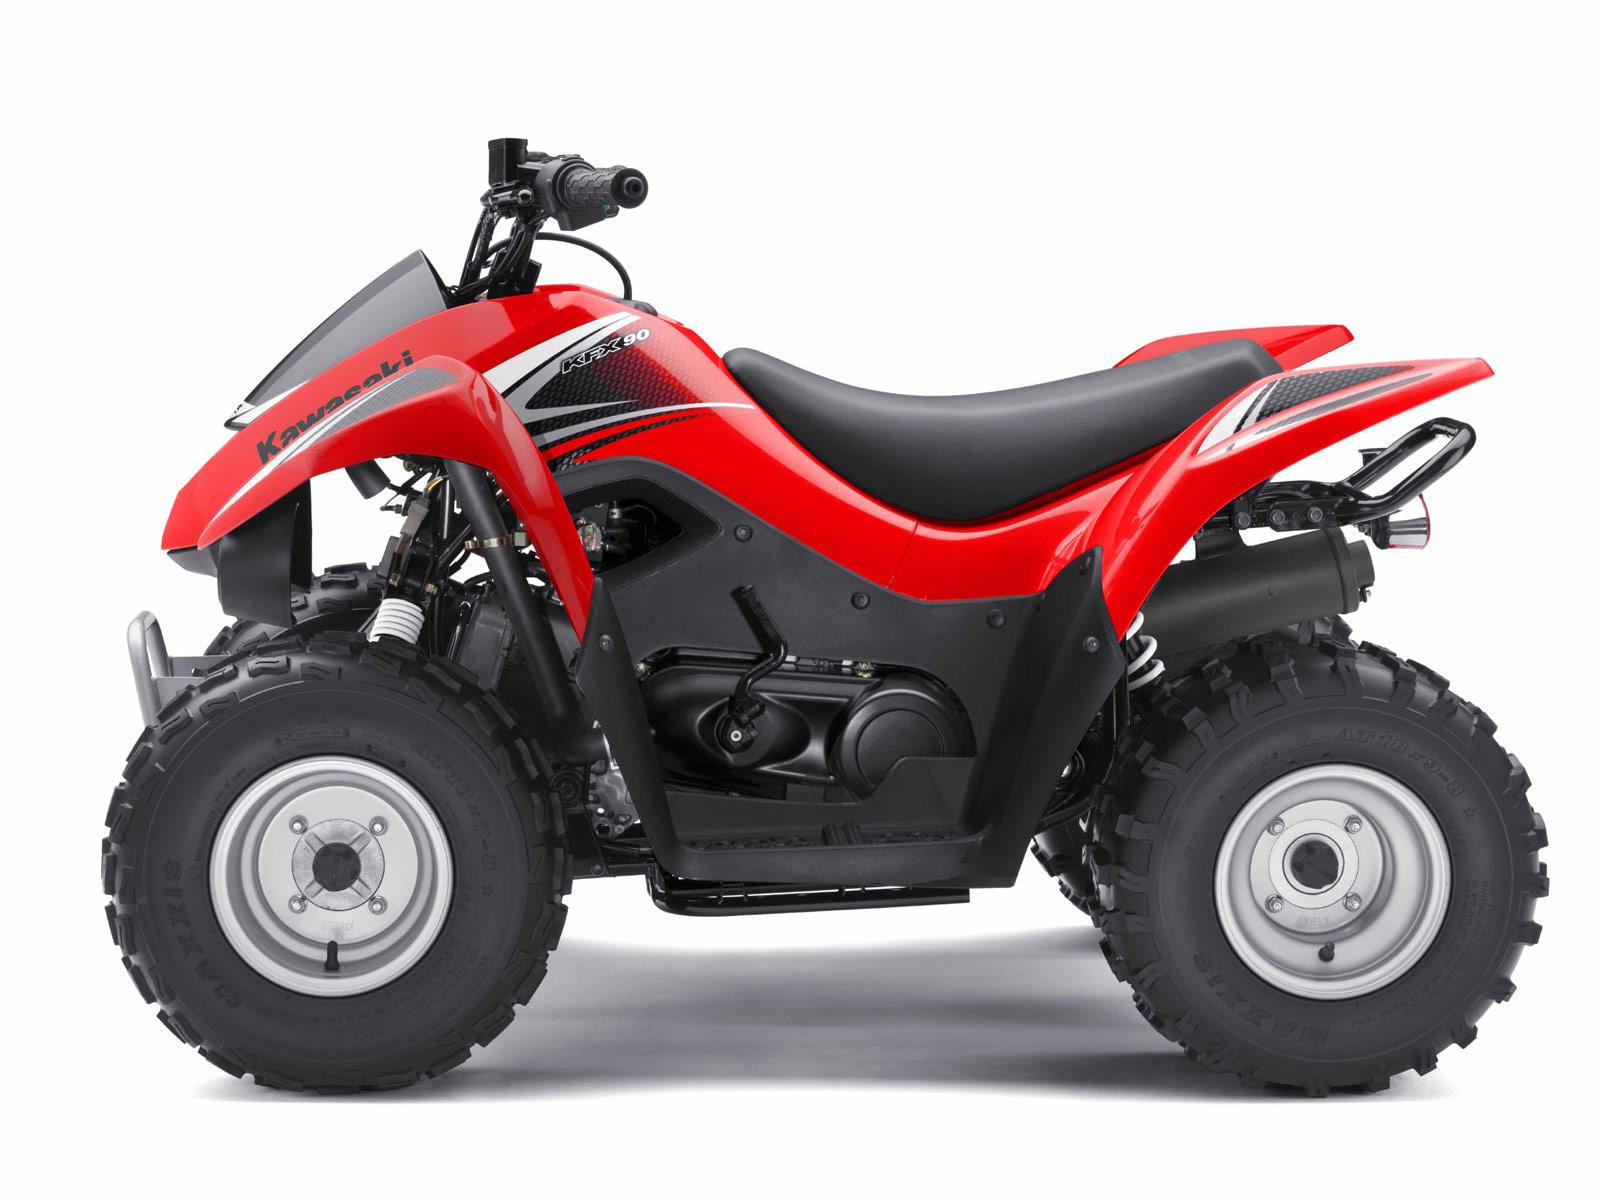 Yamaha V Star 1100 Engine Diagram Not Lossing Wiring 2009 1200 Harley For Raptor 2003 Davidson Motorcycle